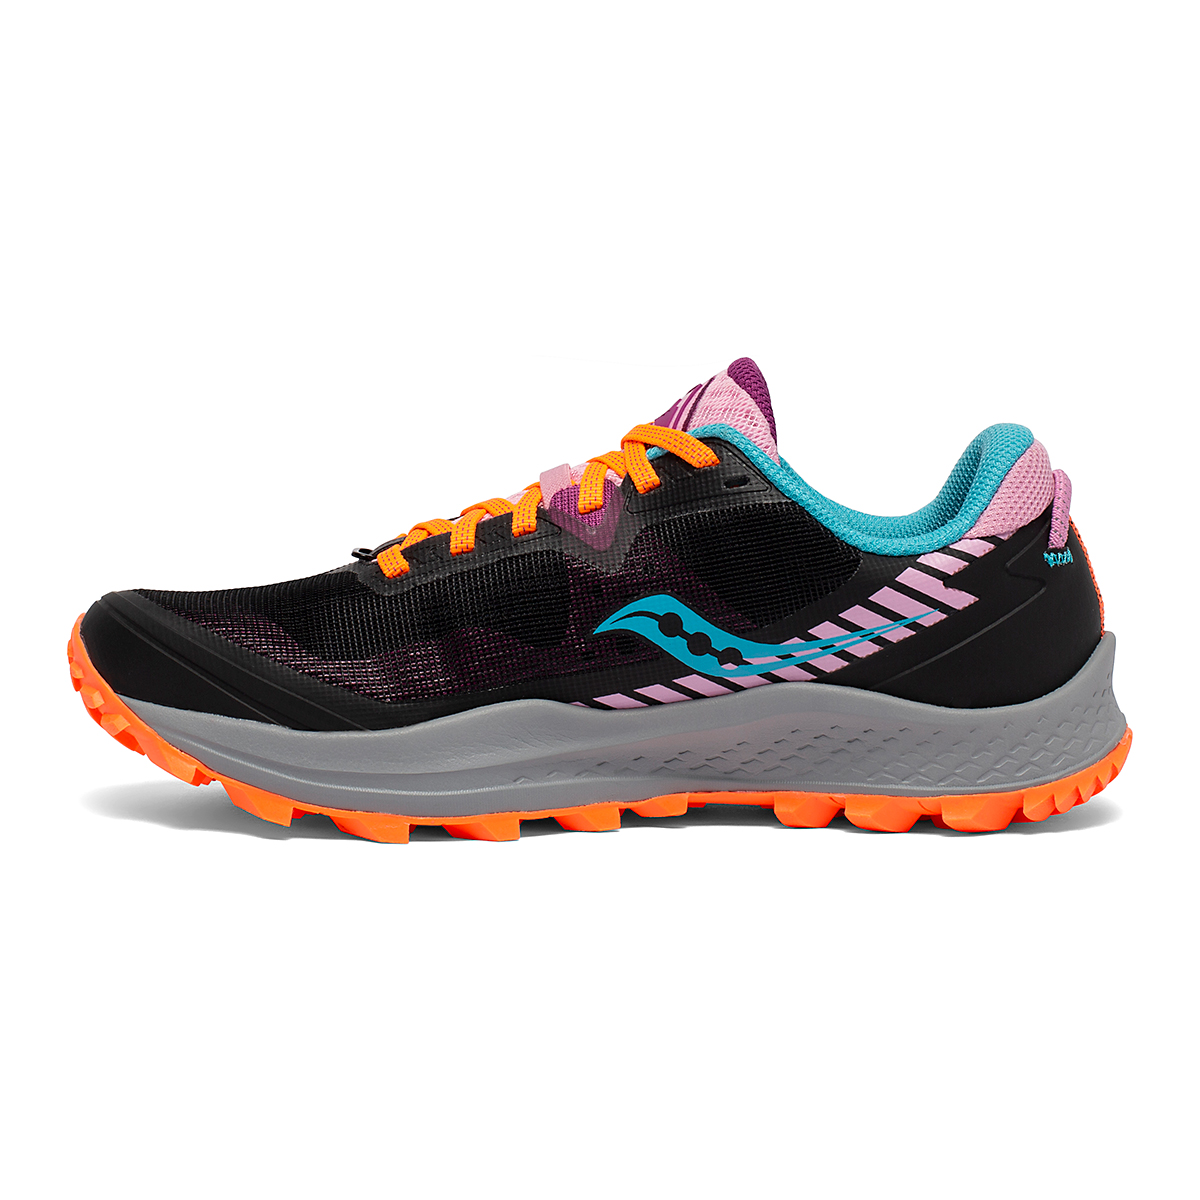 Women's Saucony Peregrine 11 Trail Running Shoe - Color: Future/Black - Size: 5 - Width: Regular, Future/Black, large, image 2